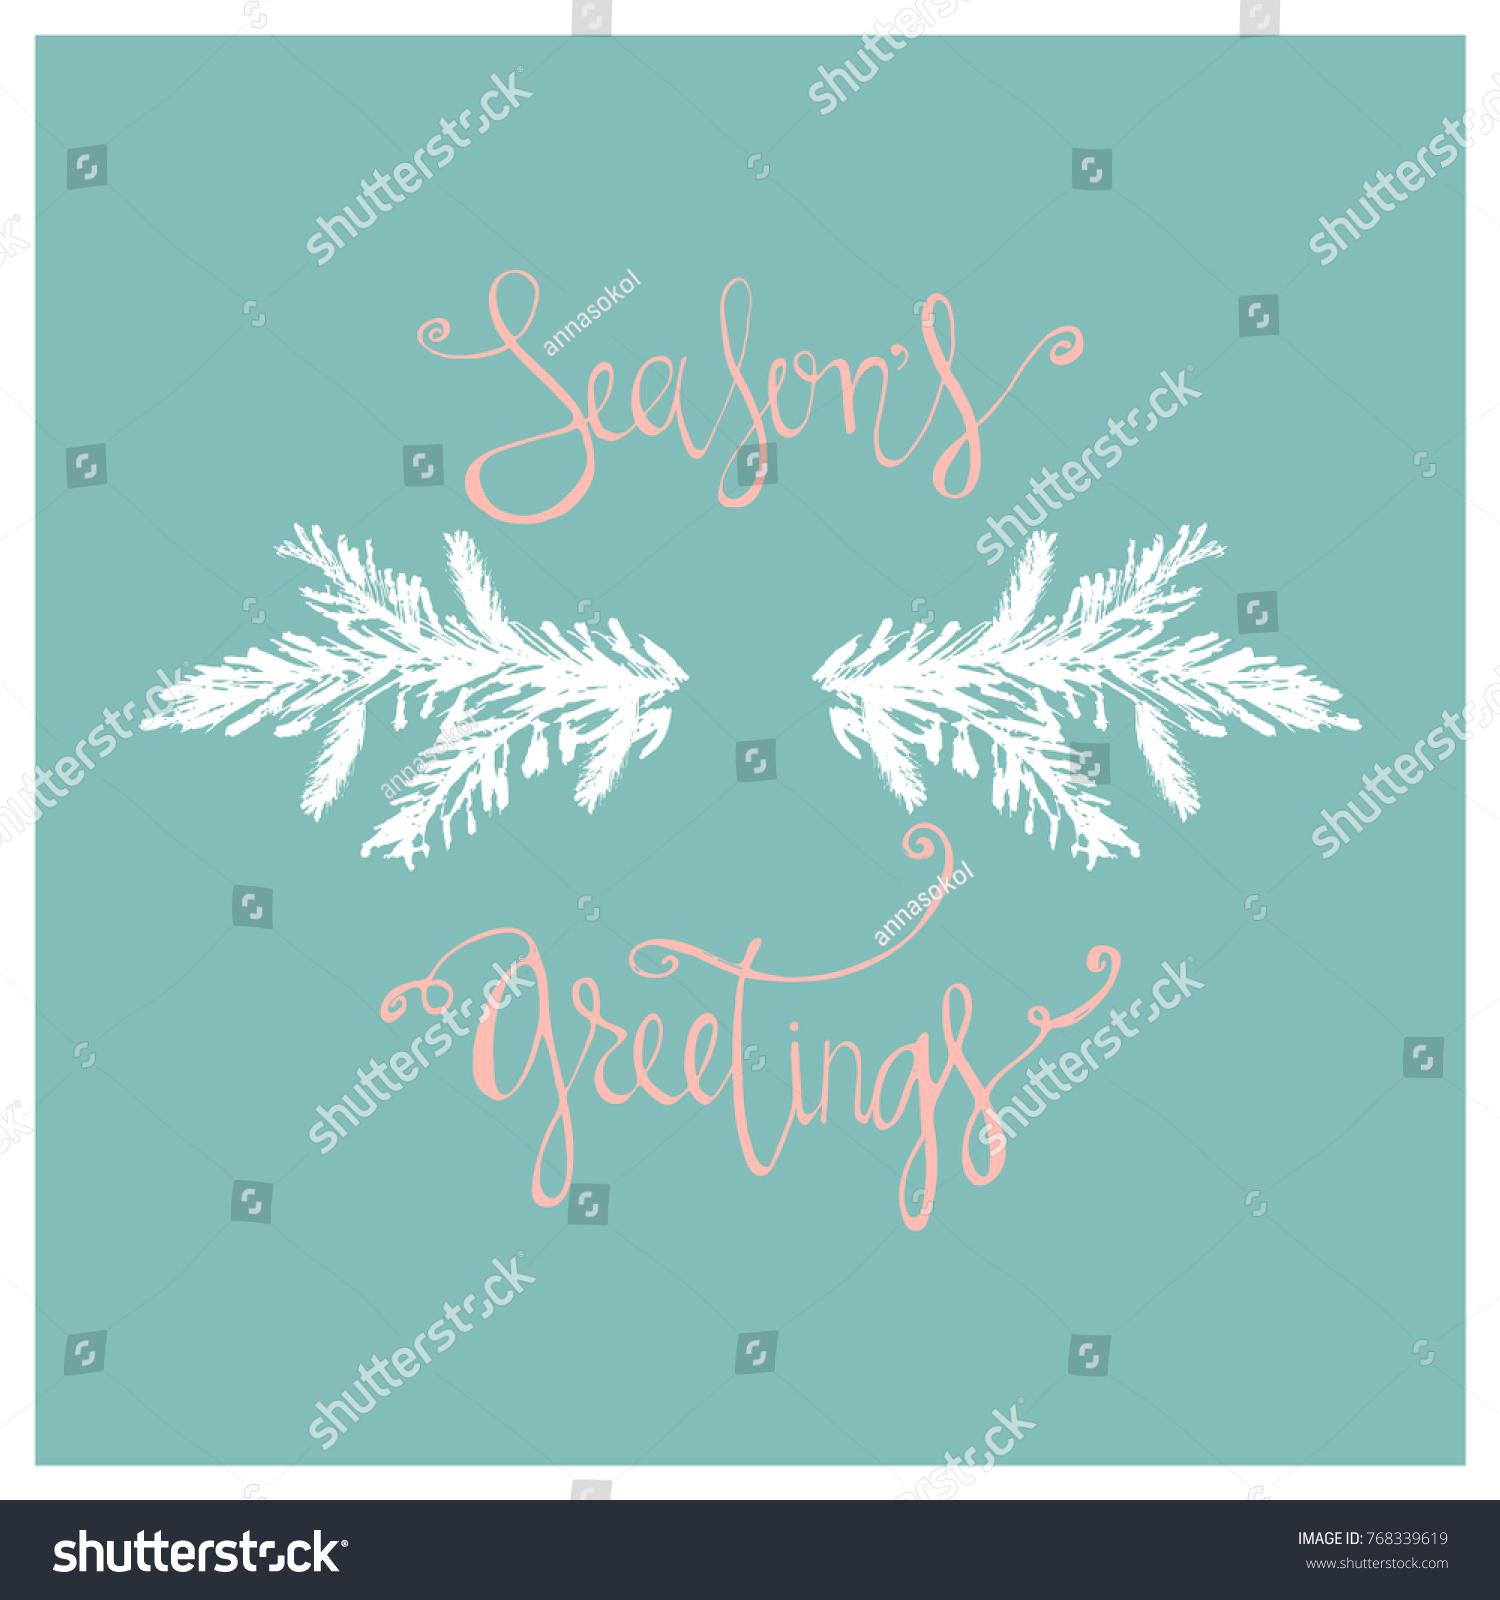 Seasons greetings xmas hand drawn christmas stock vector 768339619 seasons greetings xmas hand drawn christmas tree branch and lettering card design cute xmas holiday kristyandbryce Choice Image